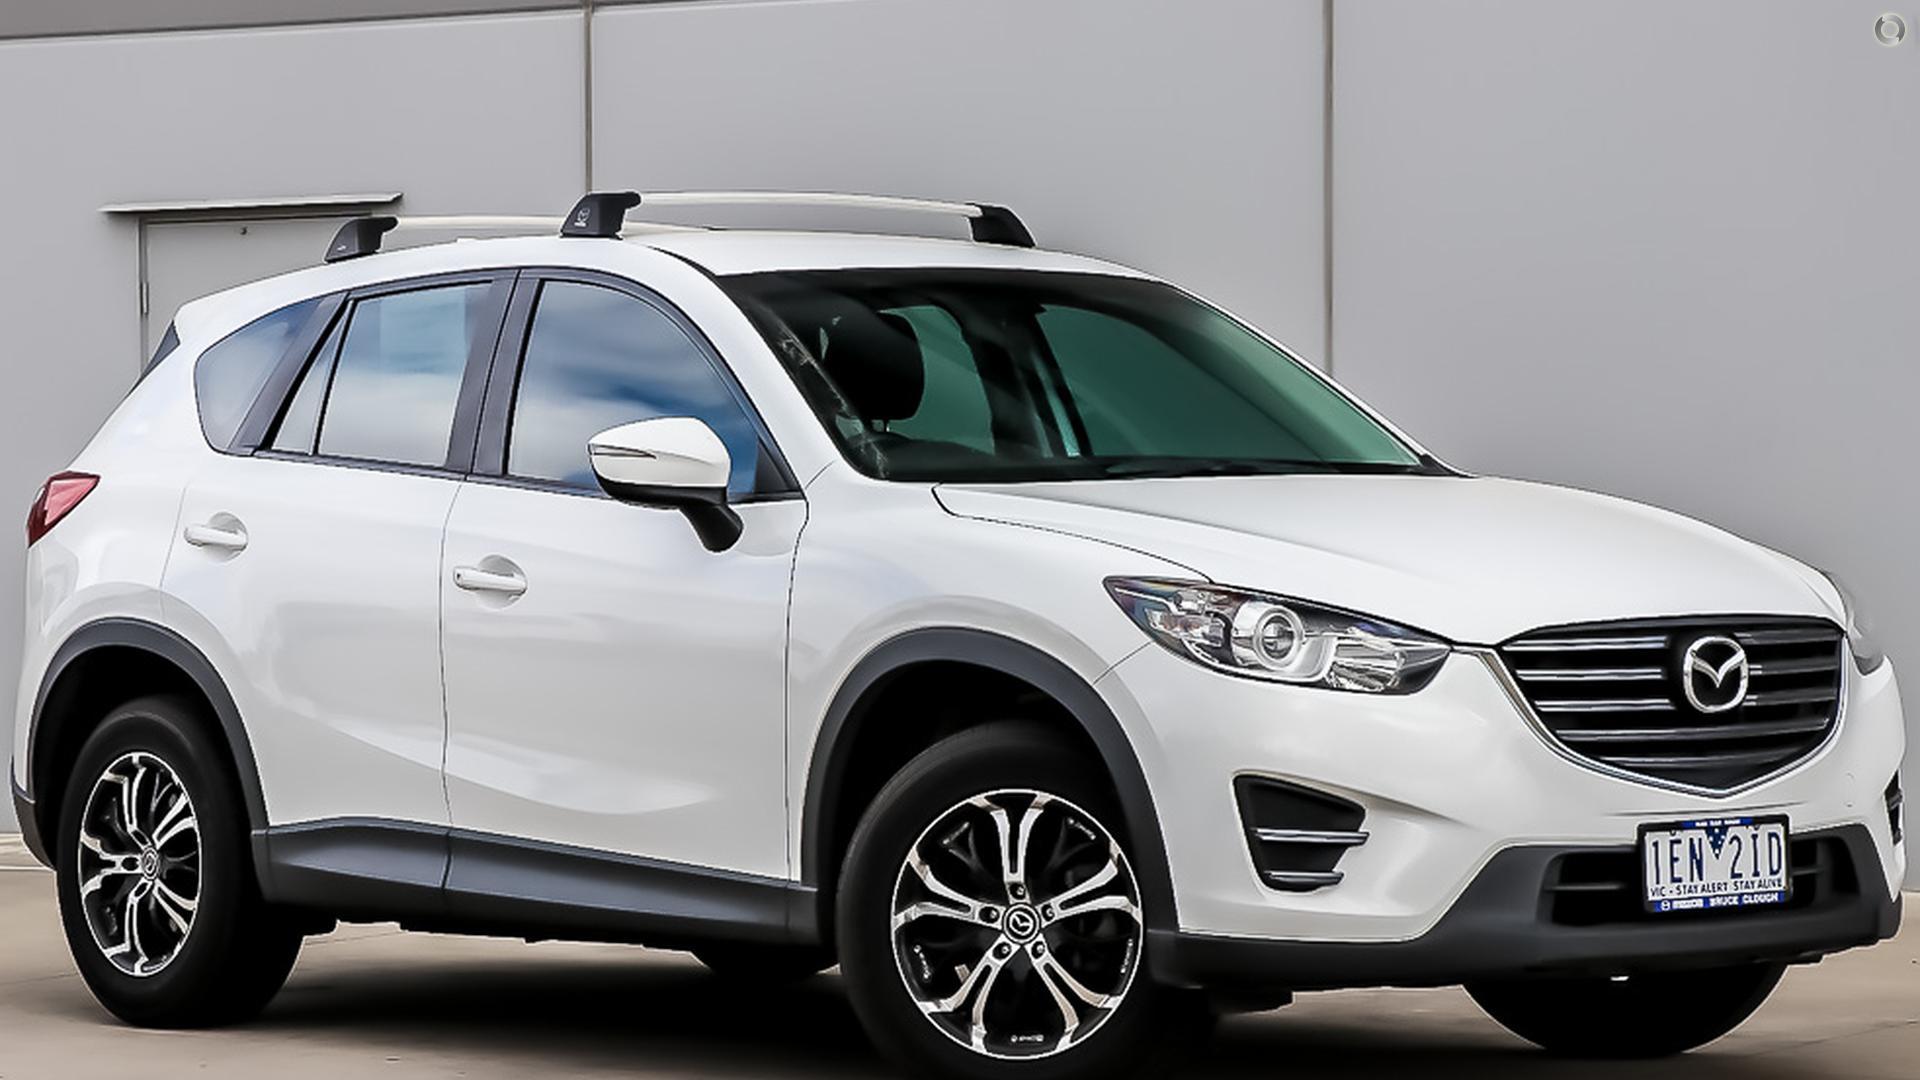 2015 Mazda Cx-5 KE Series 2